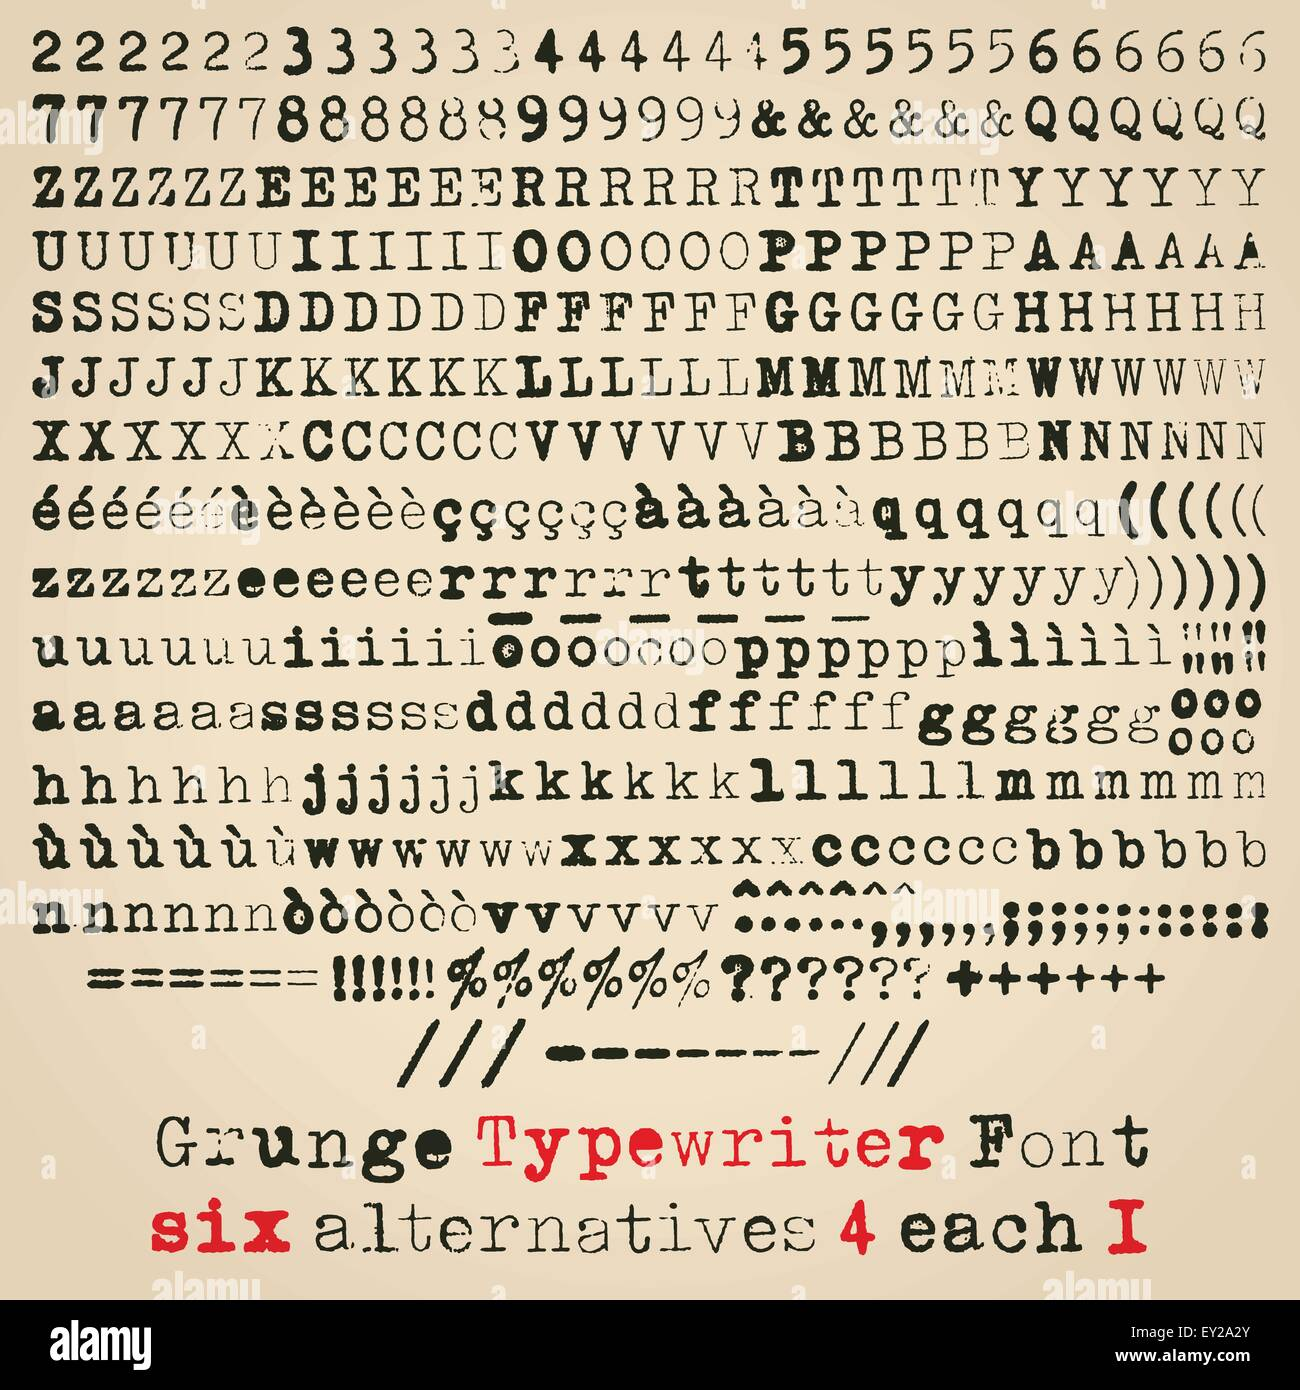 Macchina da scrivere grunge font. Sei alternative per ogni glifo Immagini Stock